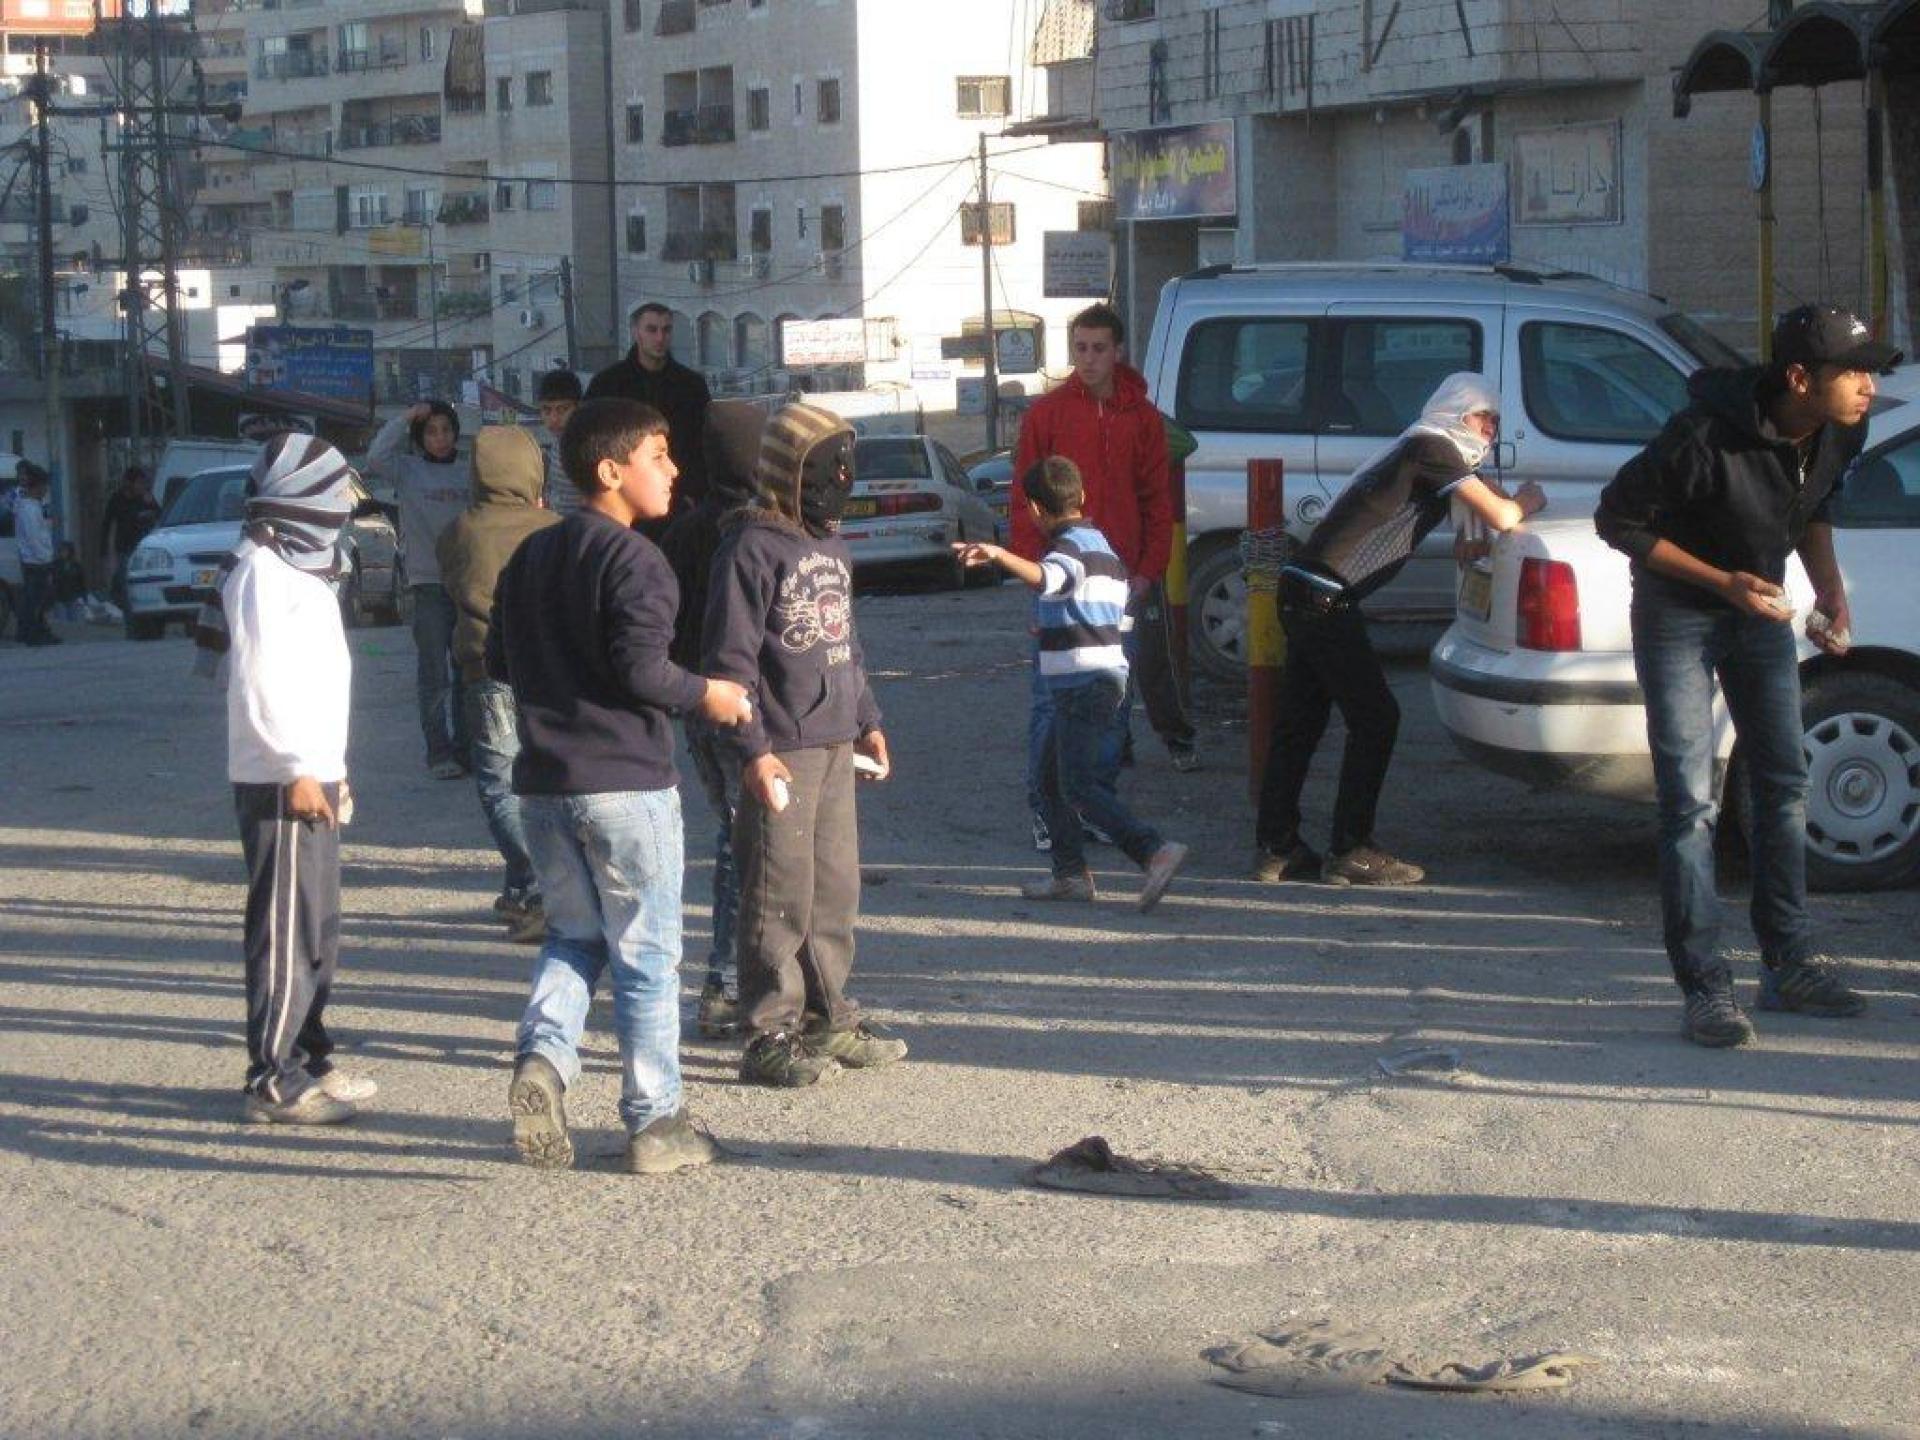 Anata/Shu'fat checkpoint 18.12.11